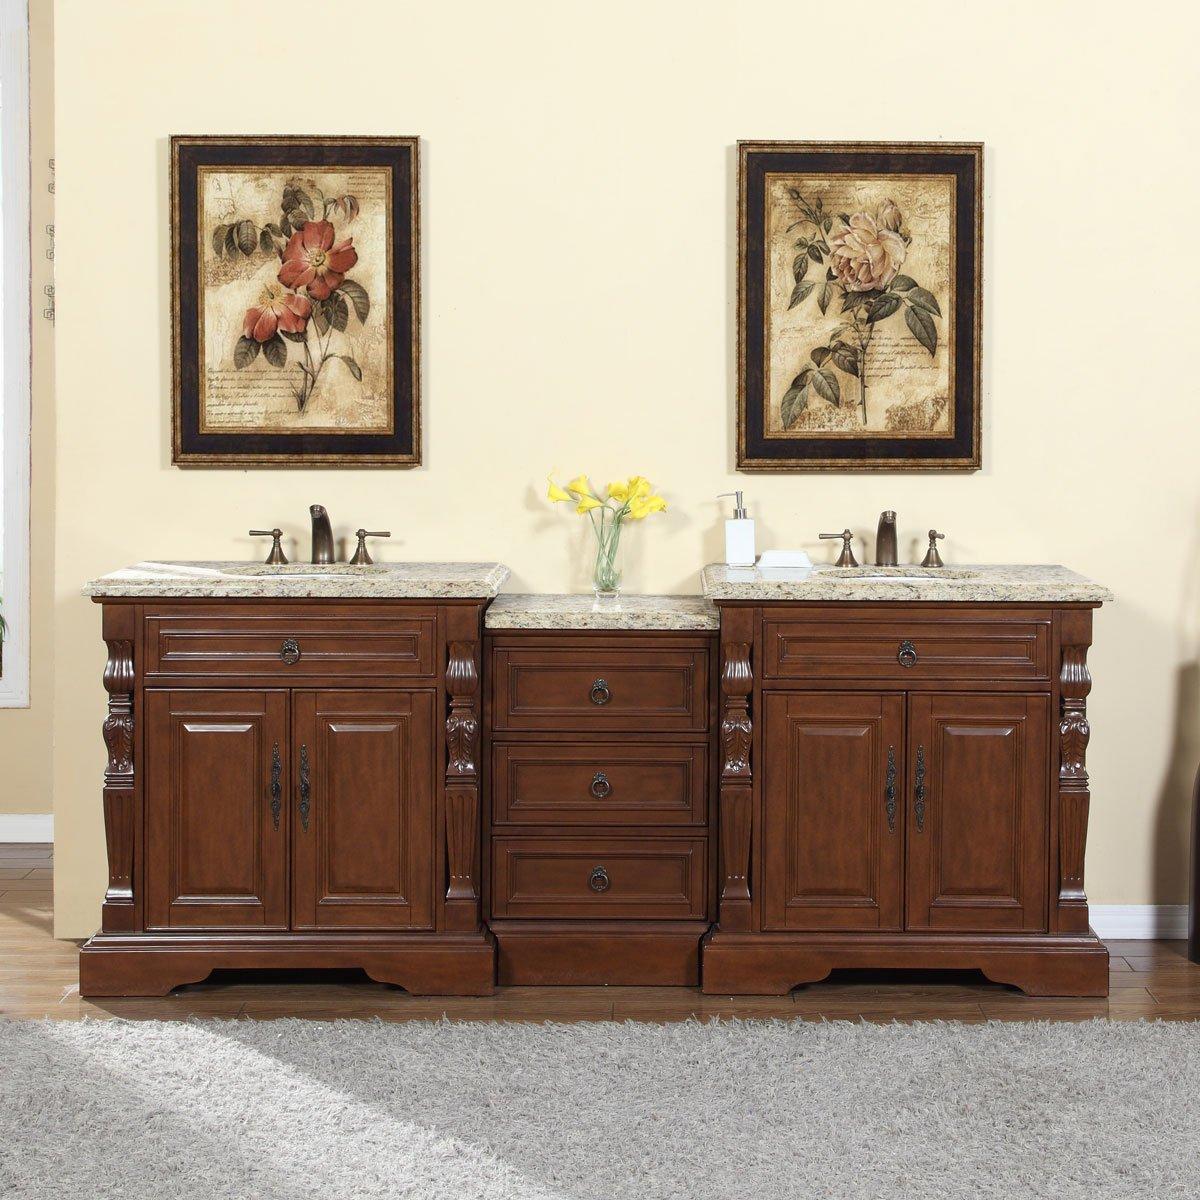 Silkroad Exclusive Bathroom Vanity Venetian Gold Granite Top Double Sink Cabinet, 90'' by Silkroad Exclusive